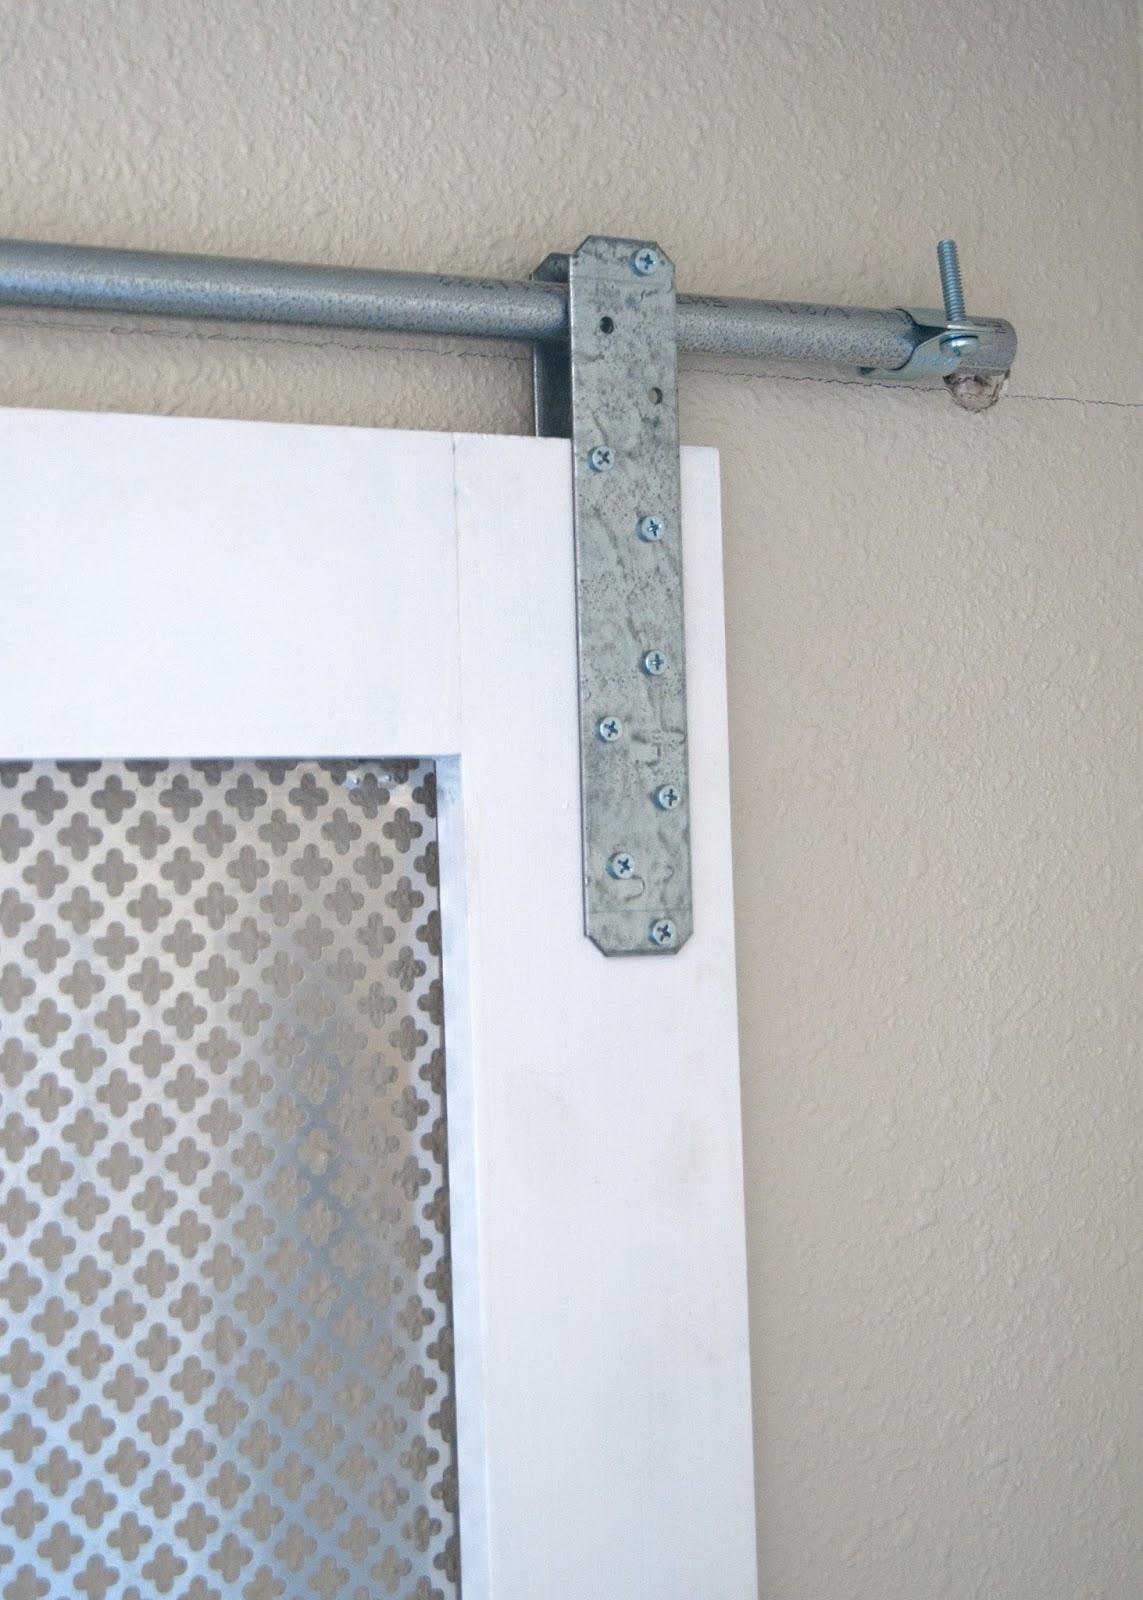 DIY Barn Door Window Cover for the Bathroom - hanging the barn door window cover